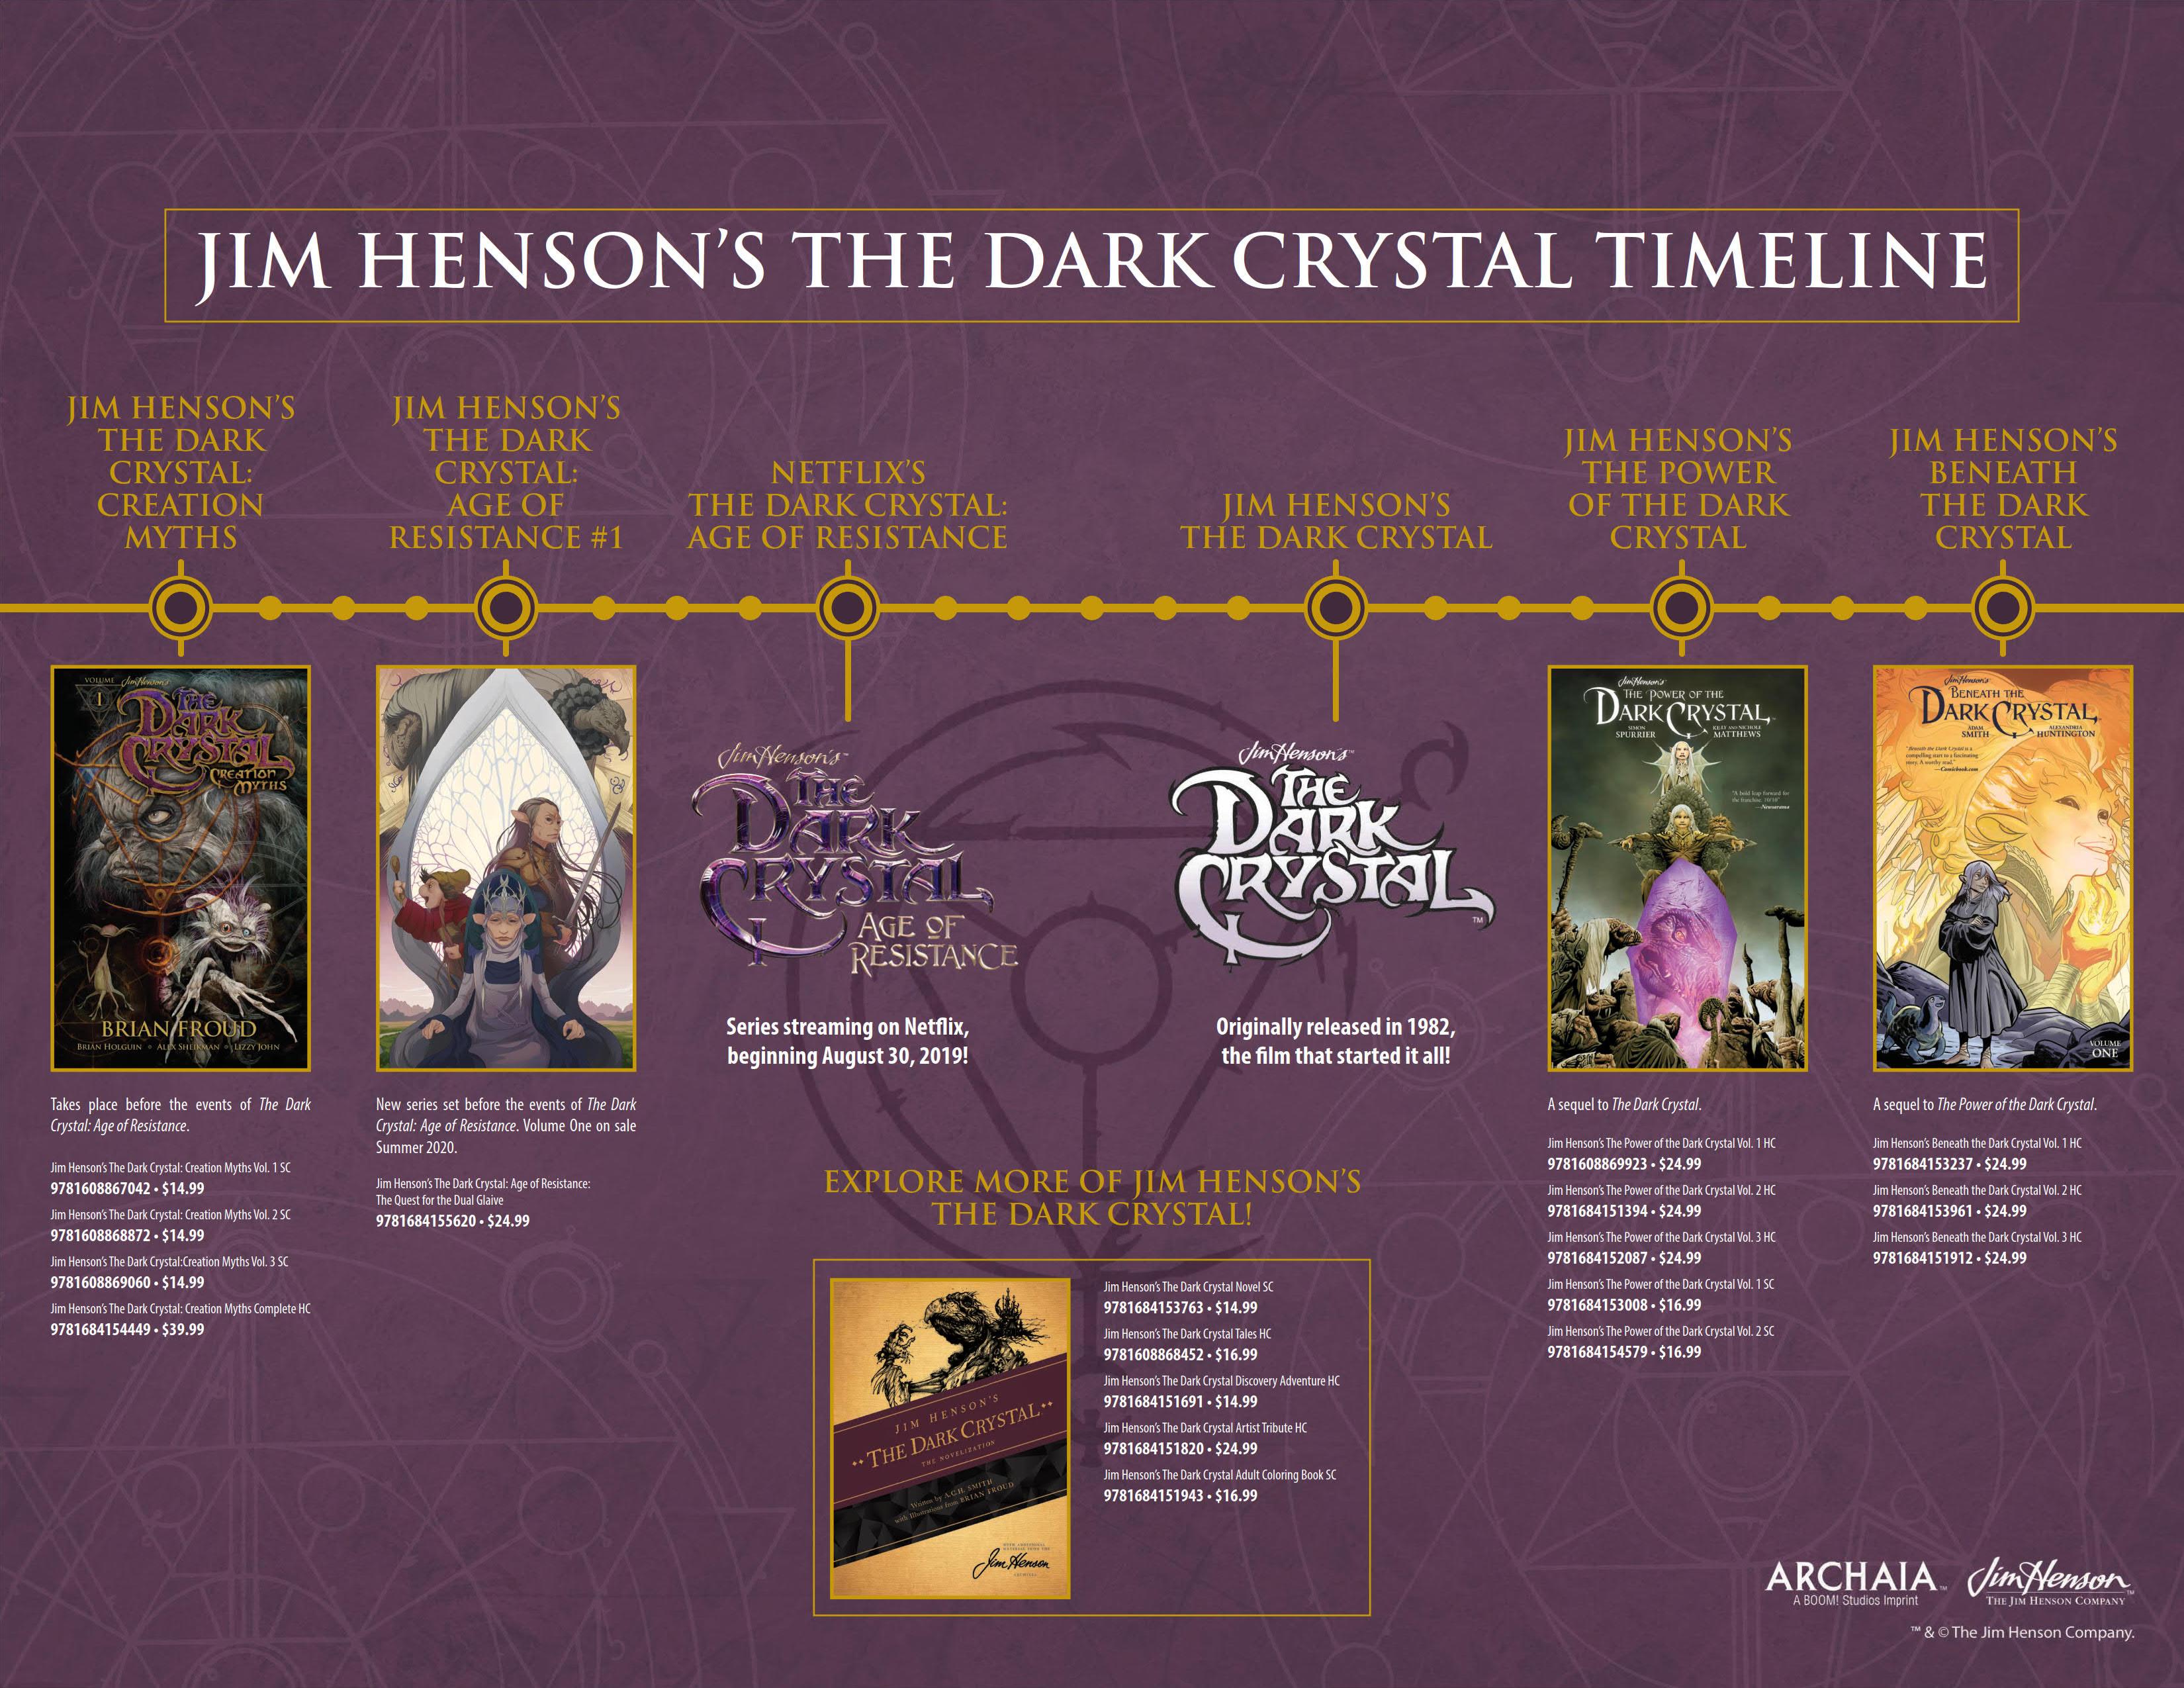 The Dark Crystal timeline